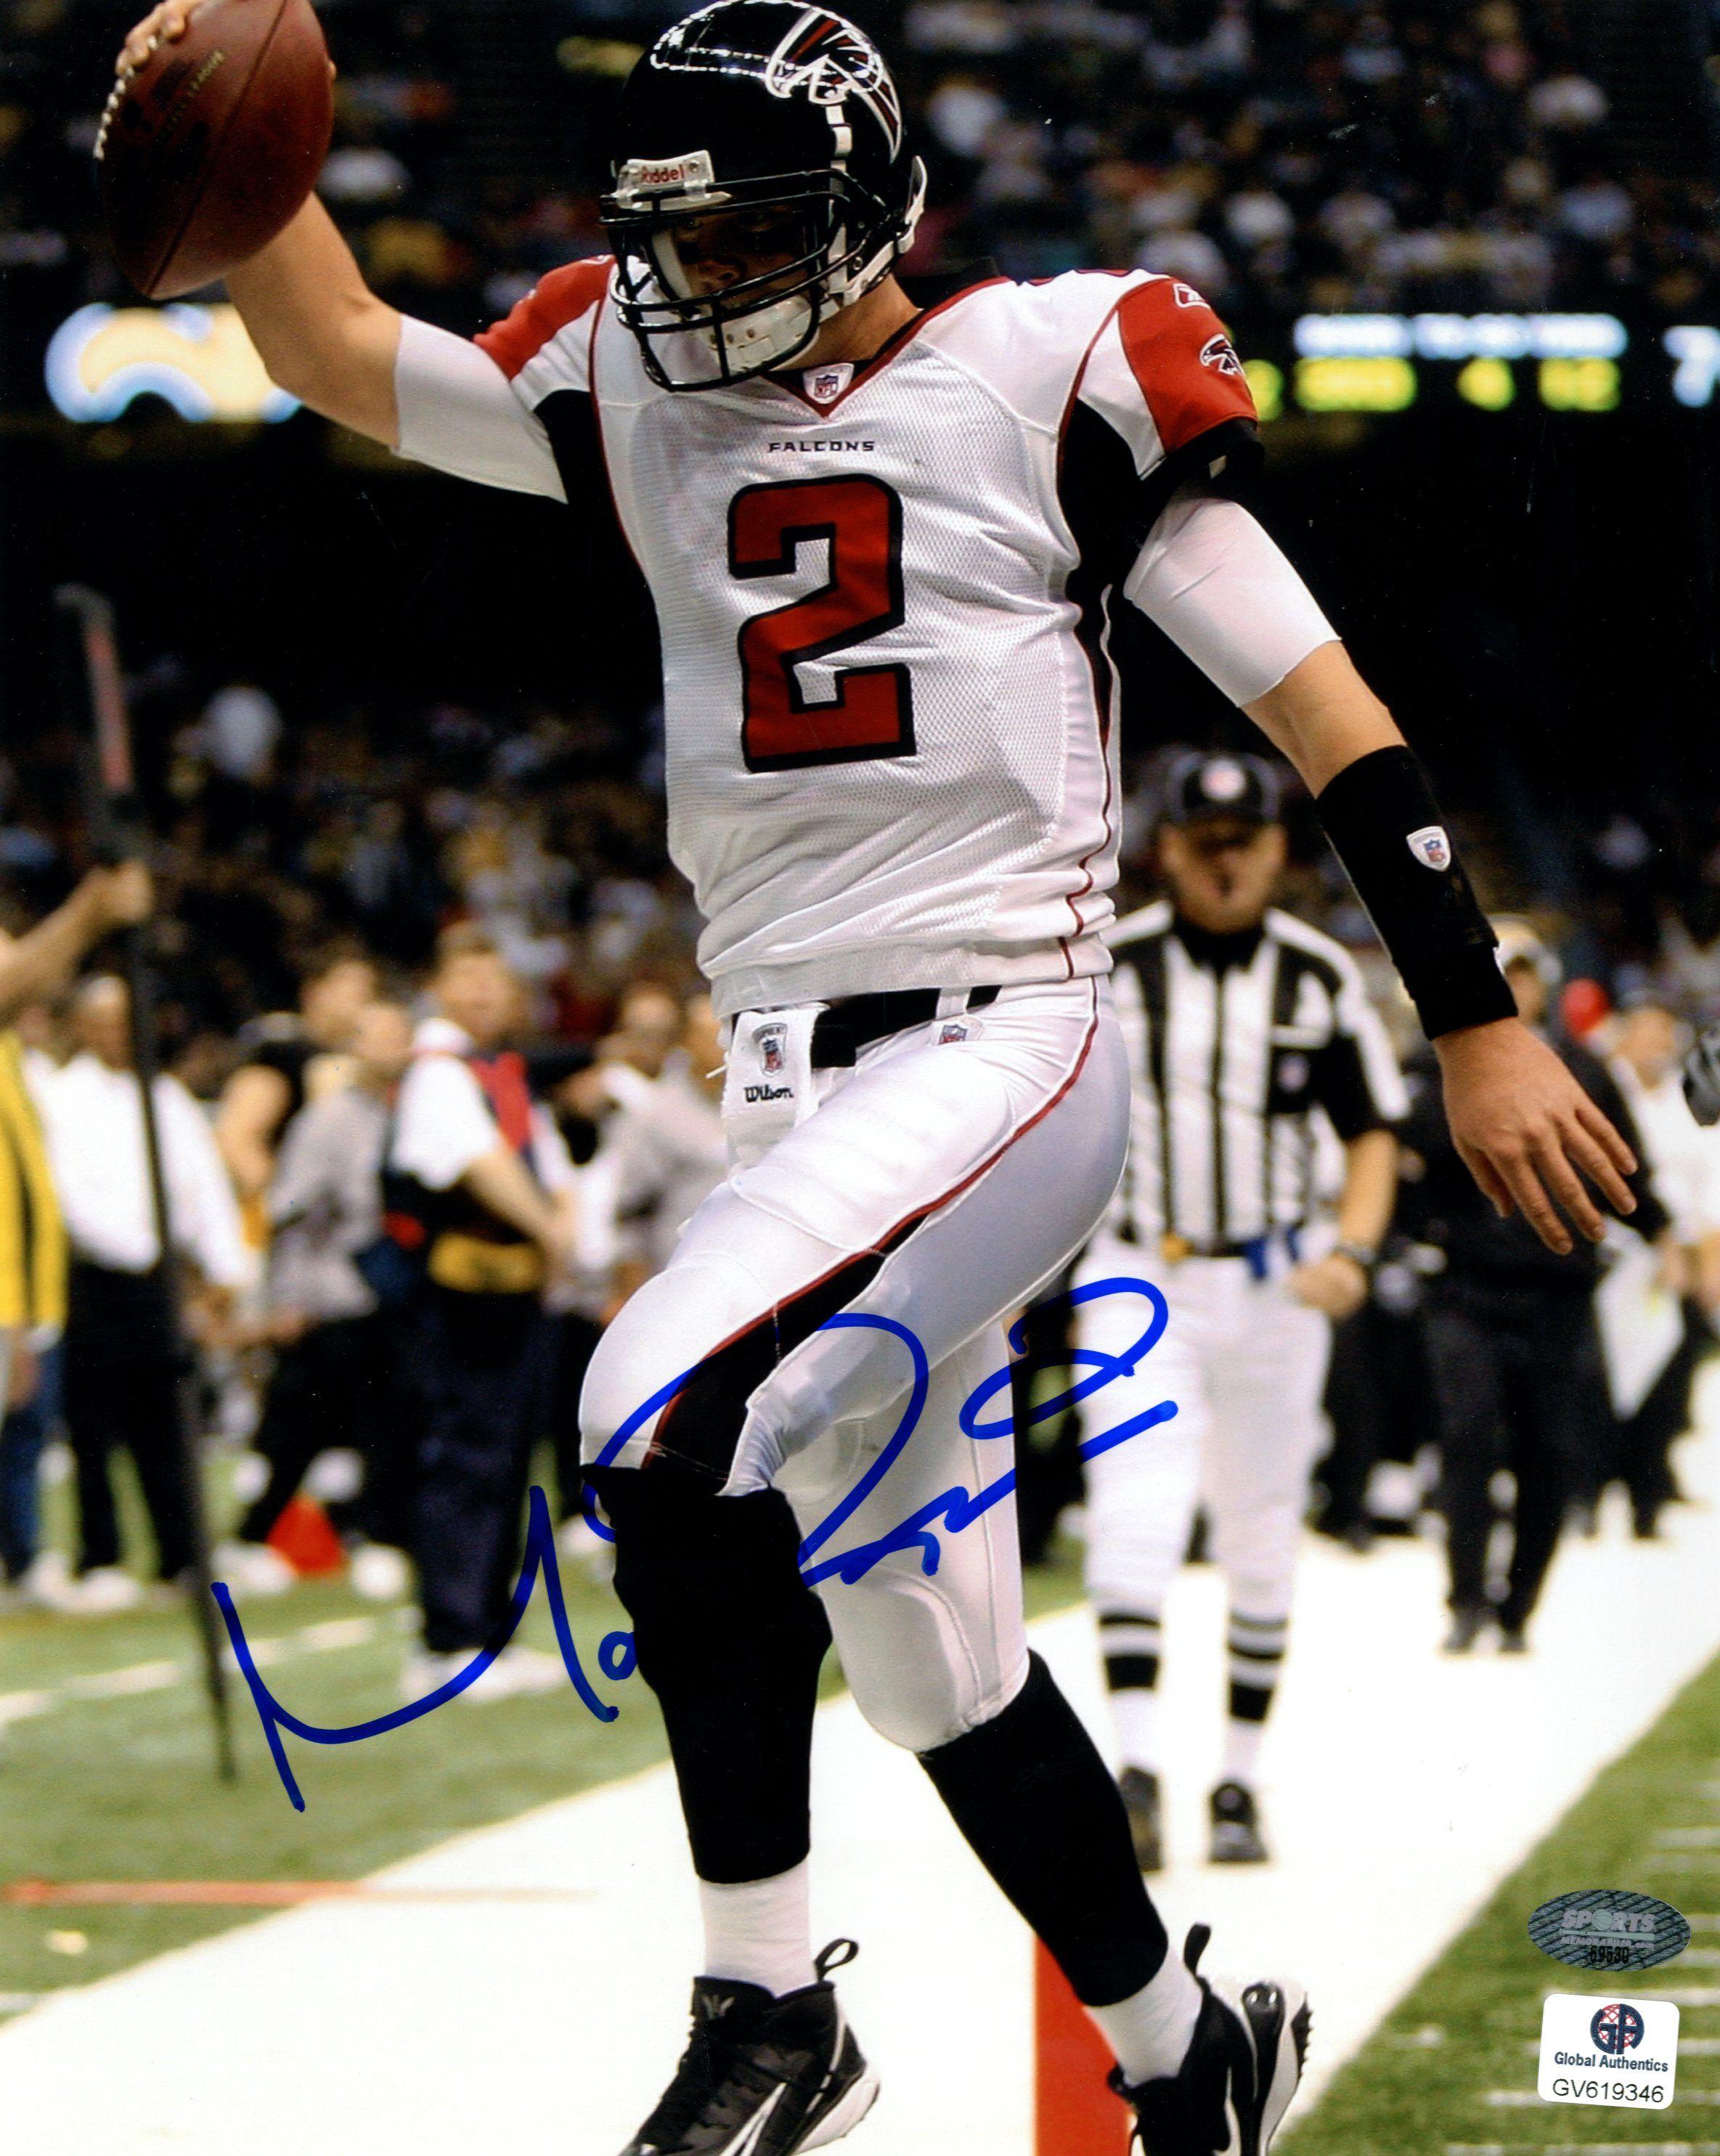 Signed Matt Ryan Photo 8x10 Ga Sports Memorabilia Mattryan Atlantafalcons Sportsmemorabilia Atlanta Falcons Atlanta Falcons Logo Falcons